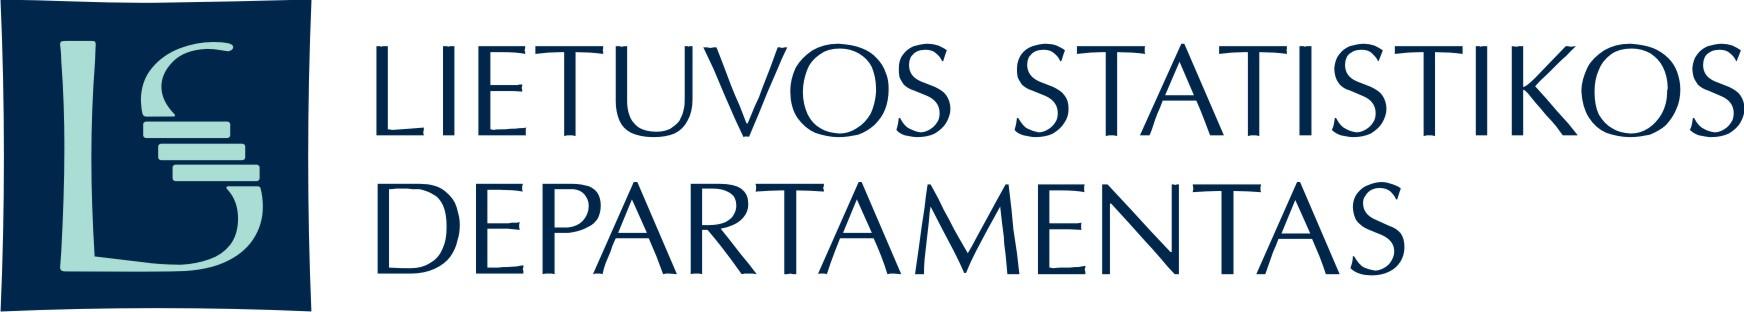 Statistikos departamentas